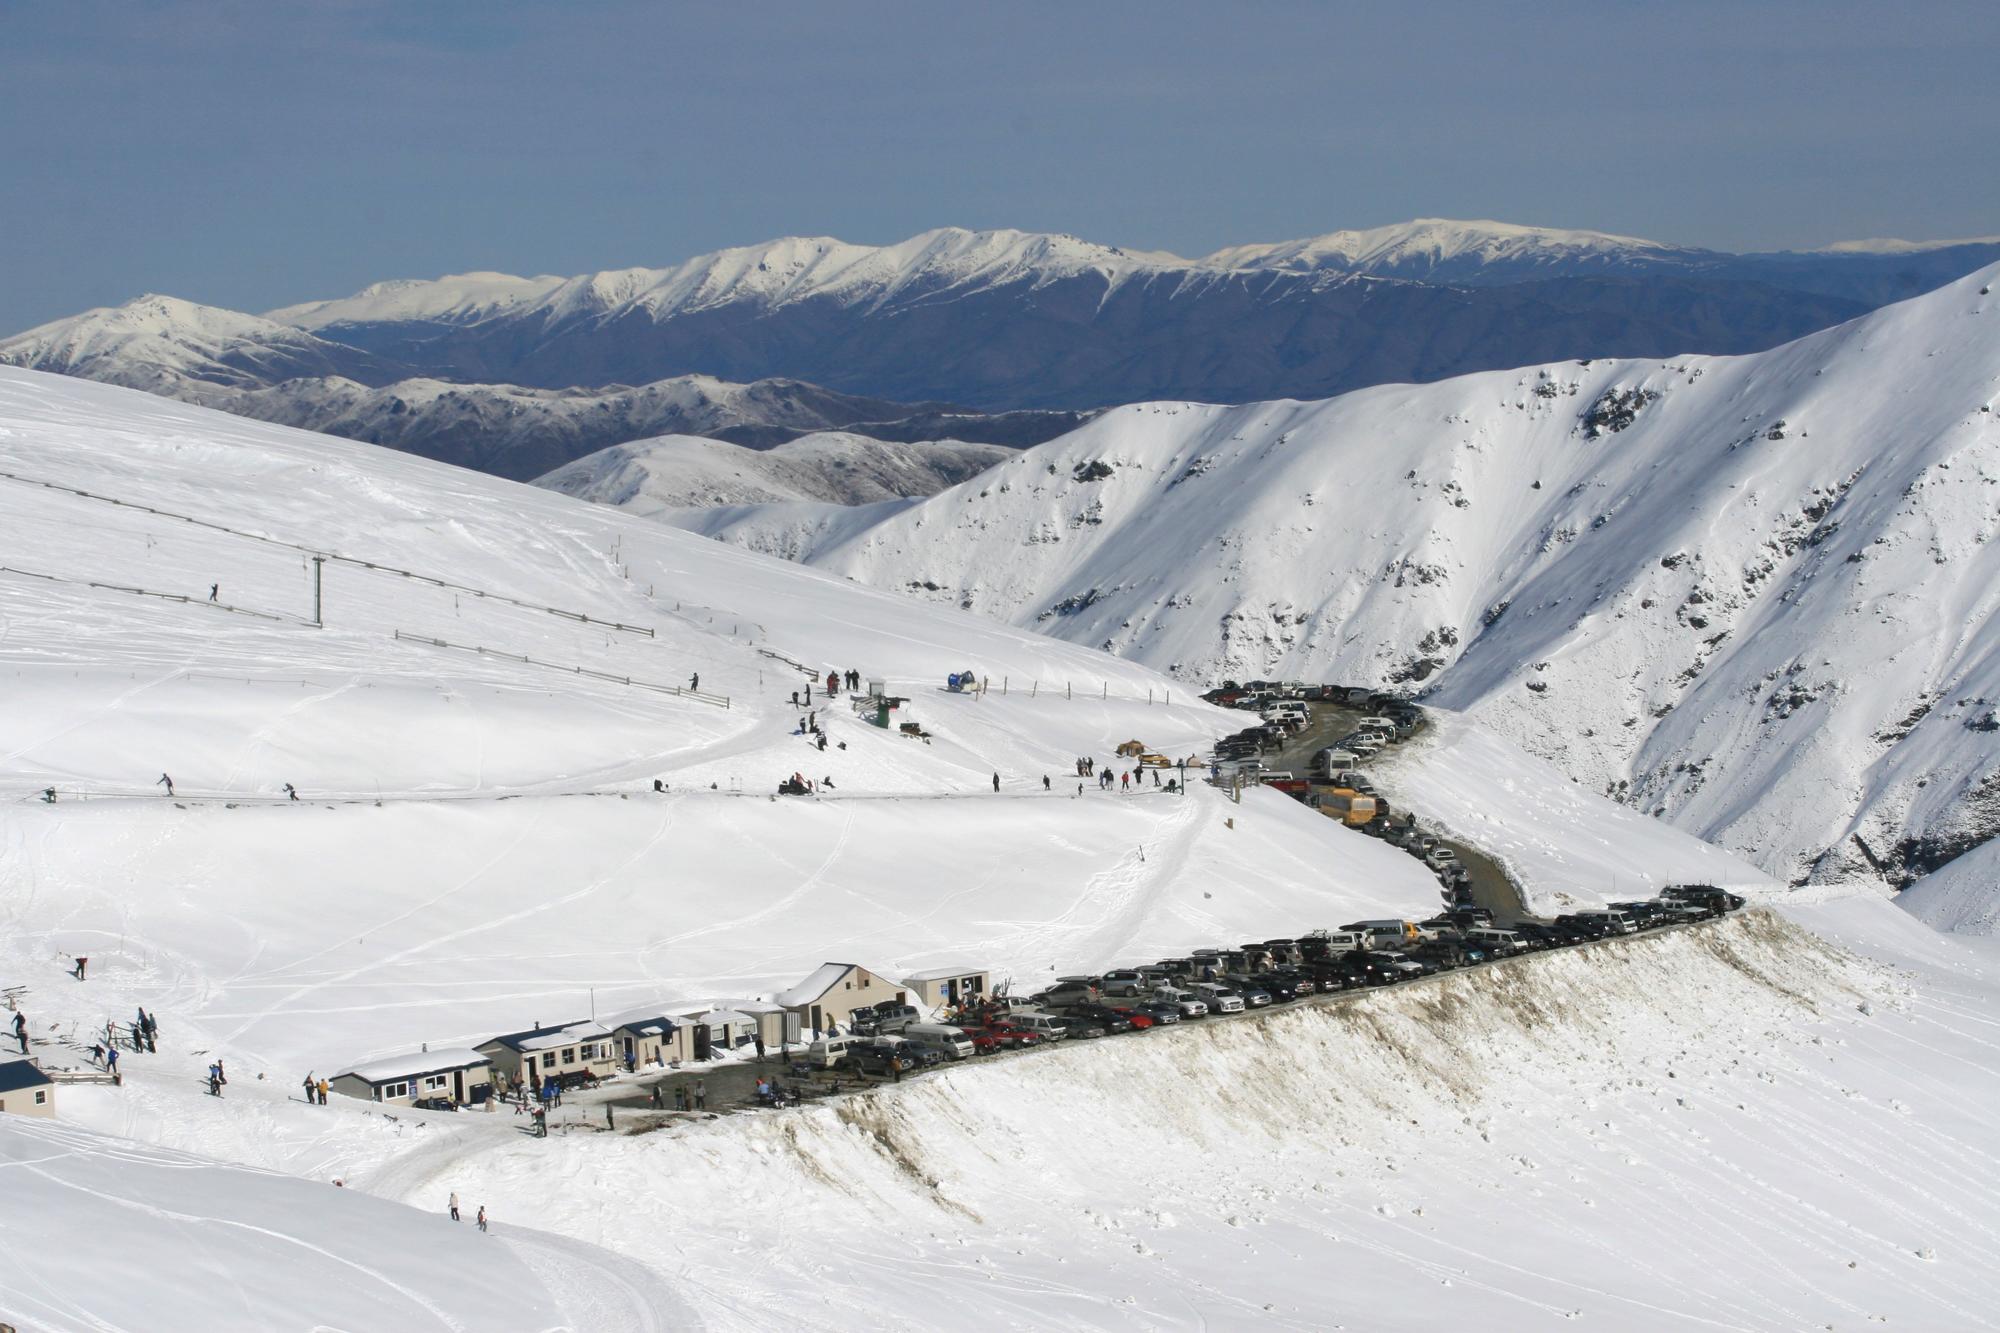 Mount Dobson ski resort, South Island, New Zealand